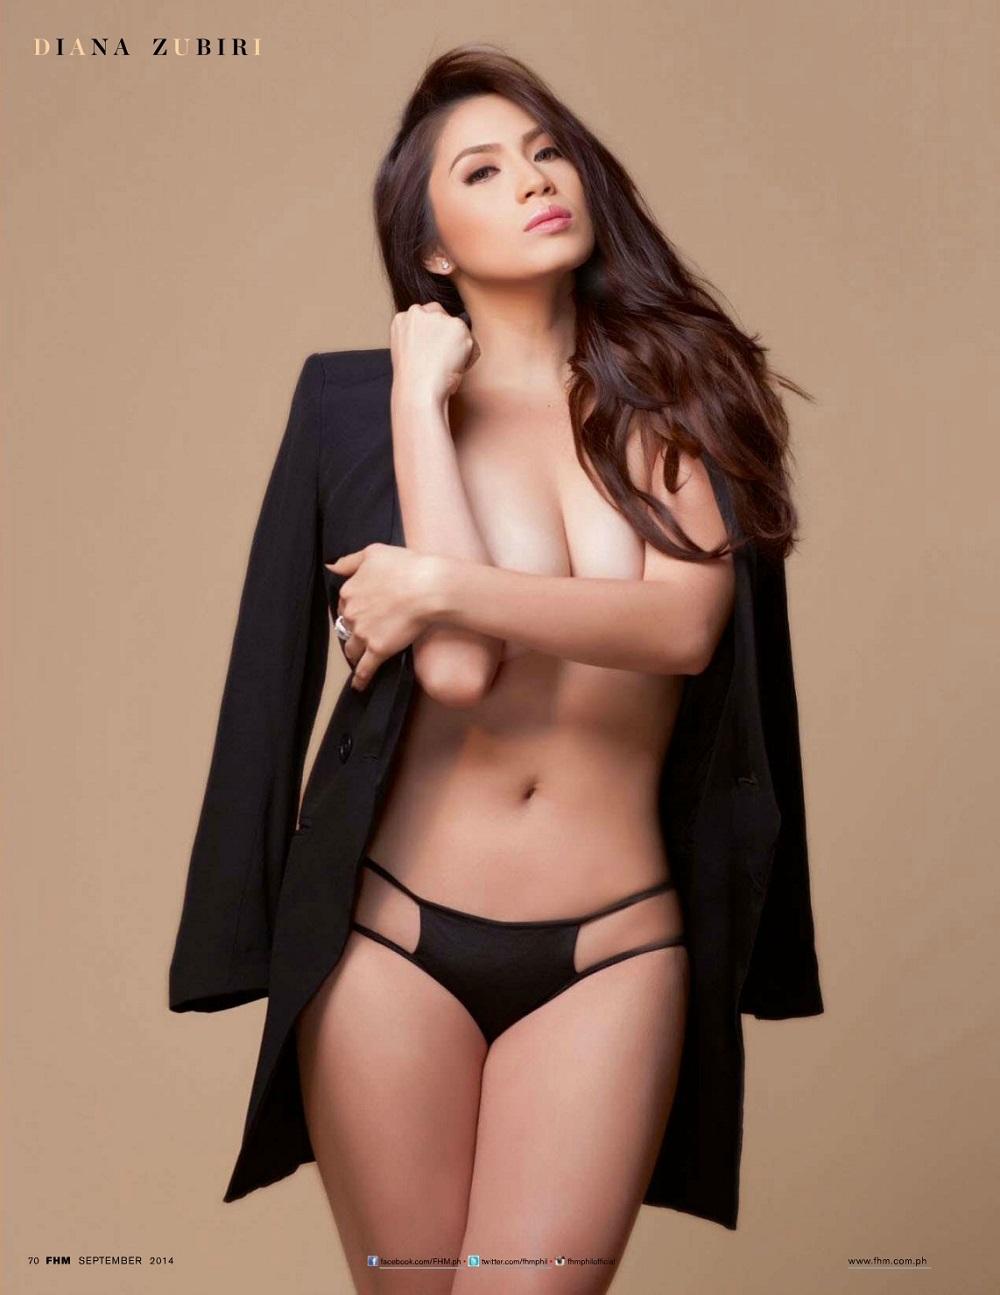 diana zubiri naked pics